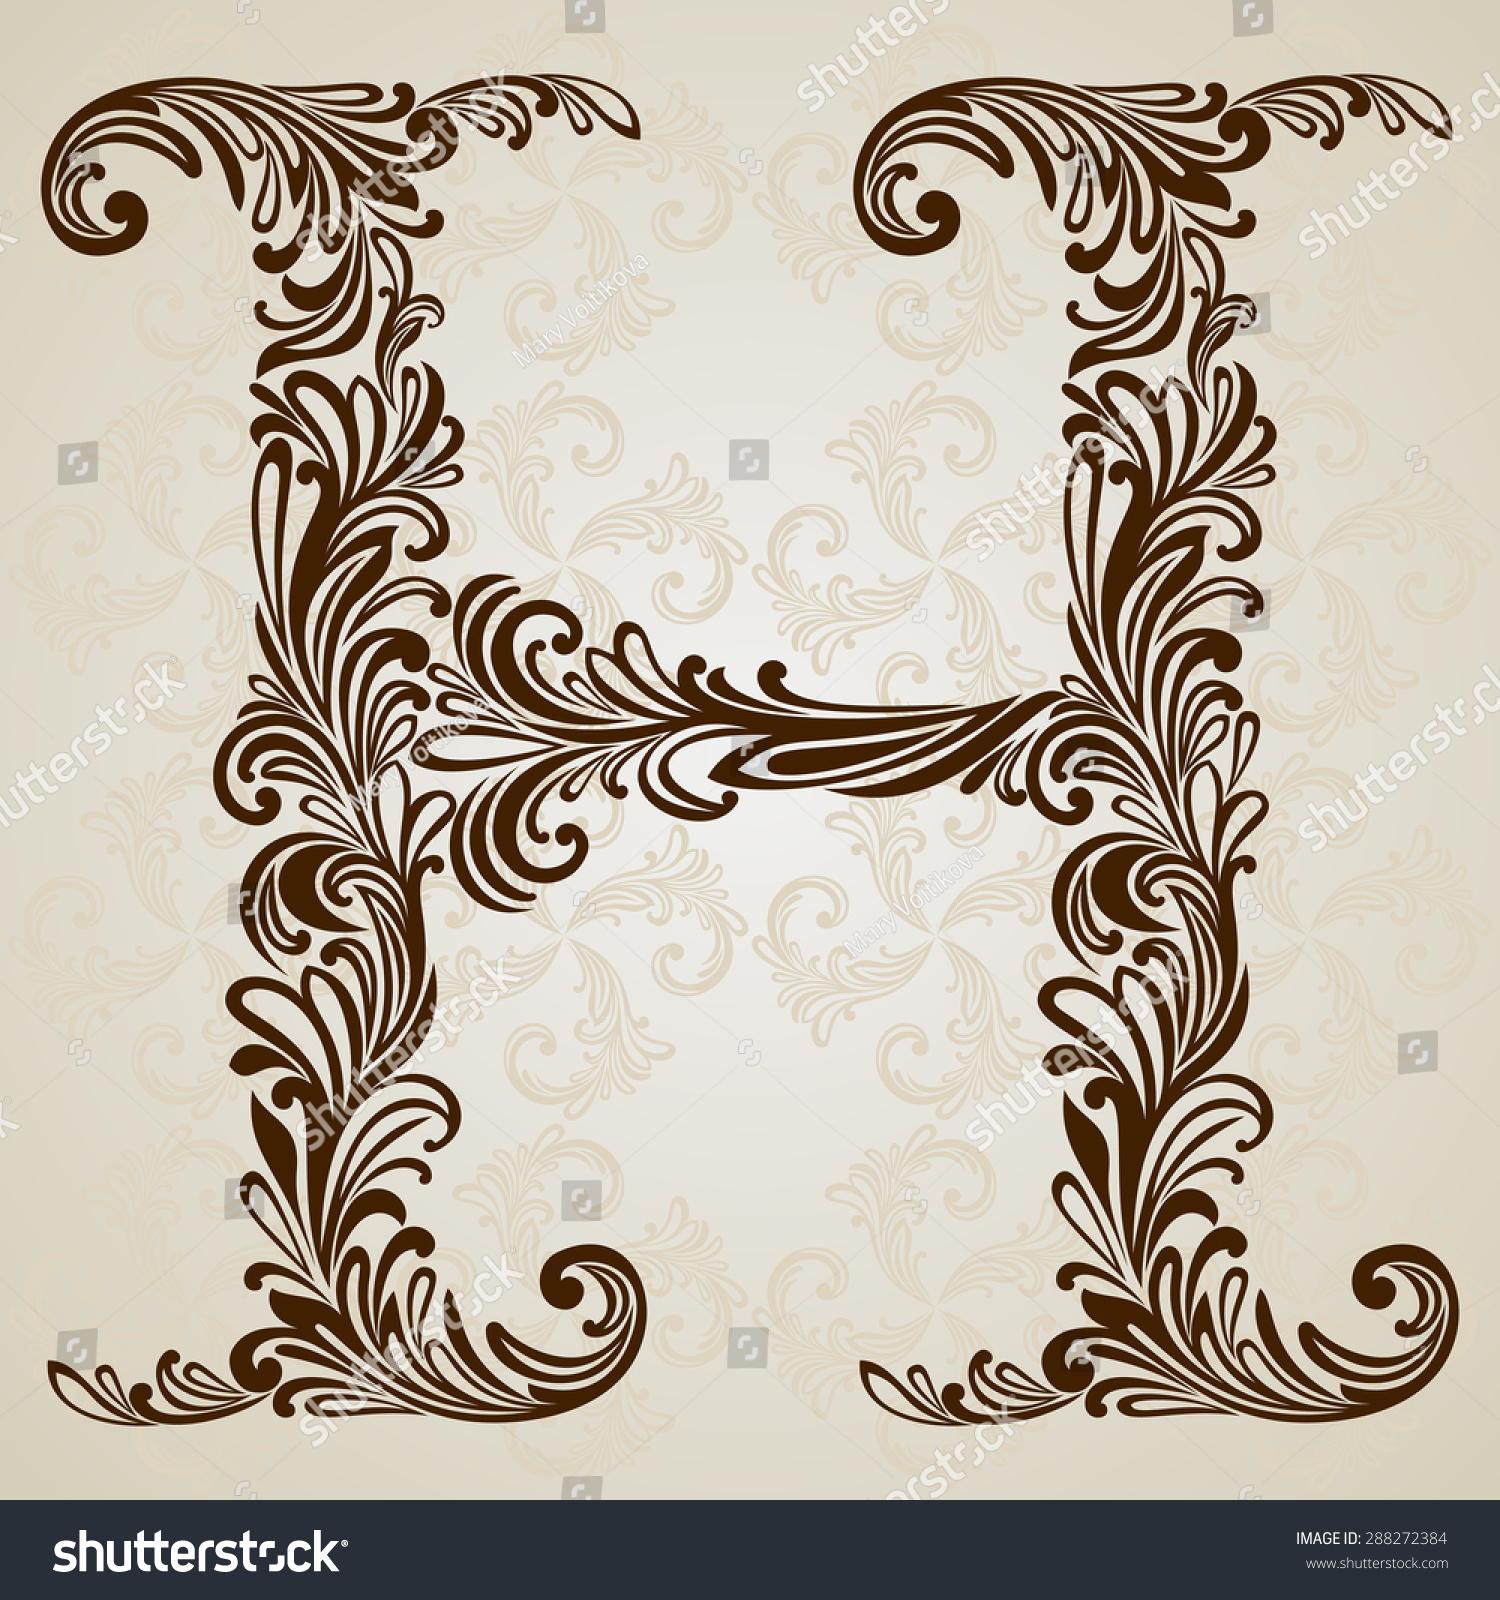 Calligraphic Font Vintage Initials Letter H Vector Design Background Swirl Style Illustration